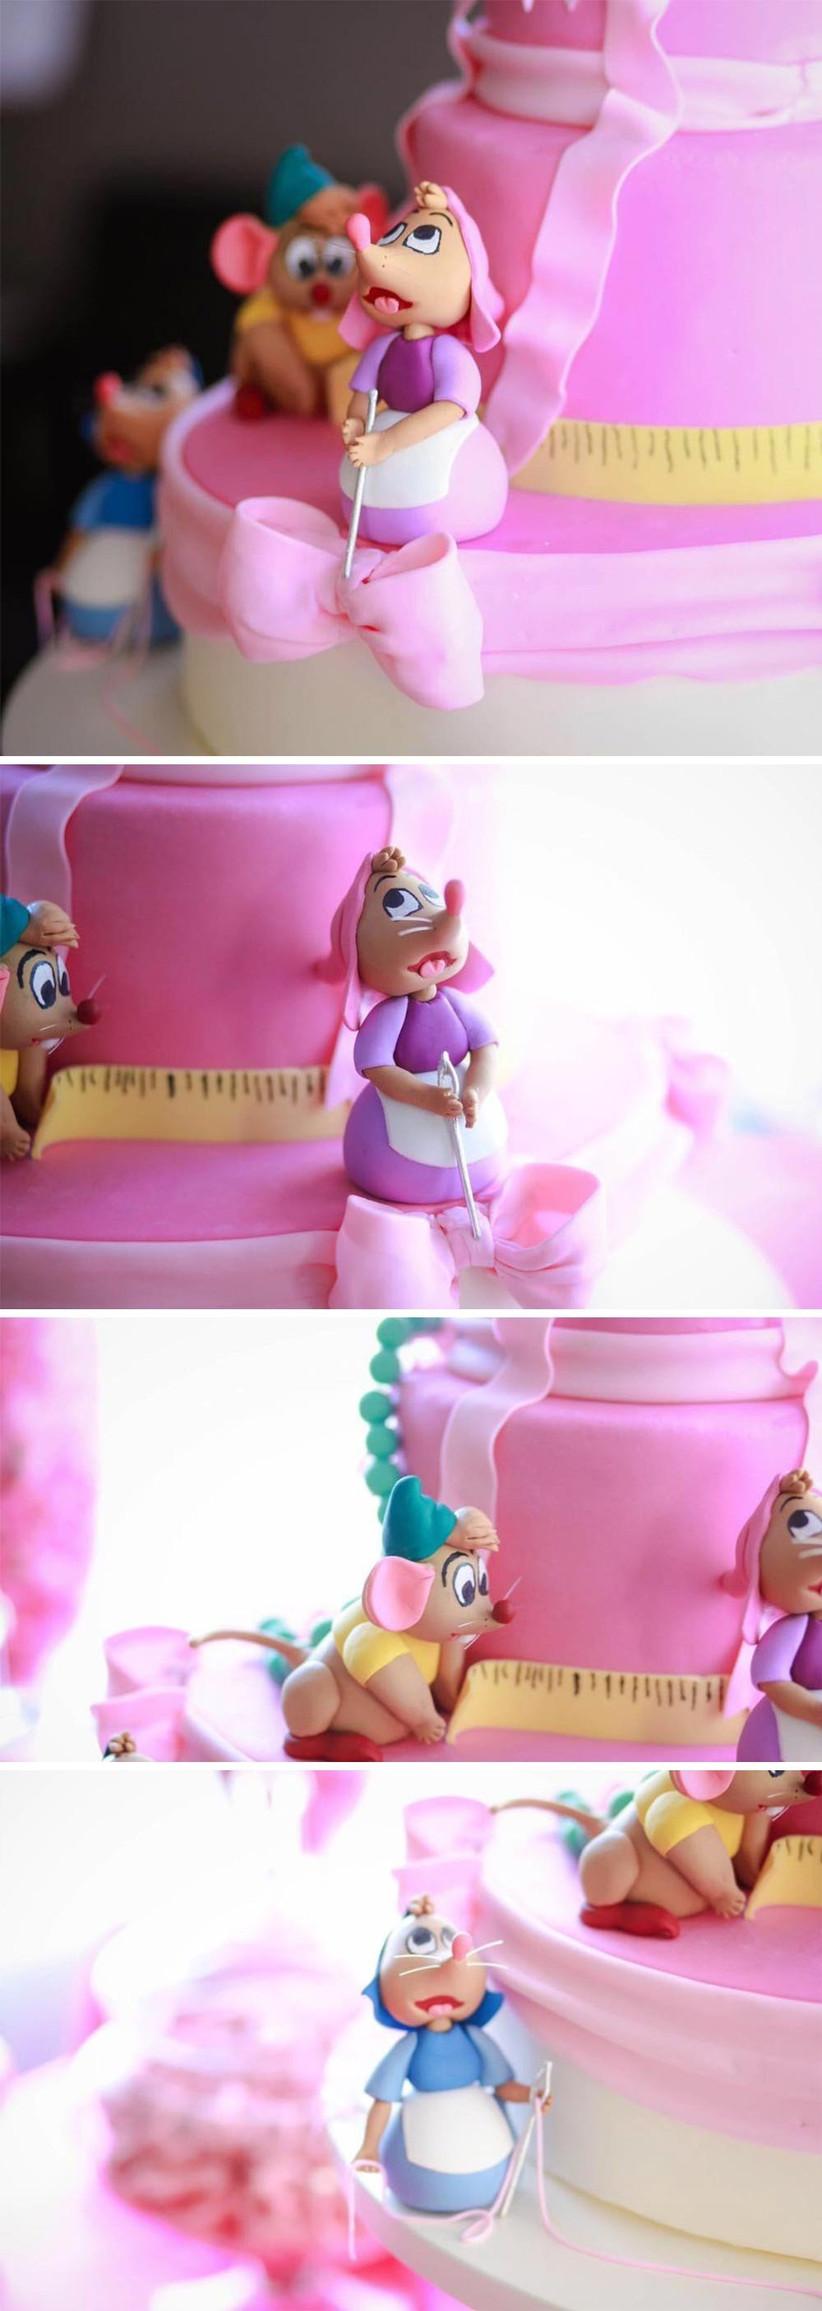 close-up-of-detailing-on-cinderella-inspired-disney-wedding-cake